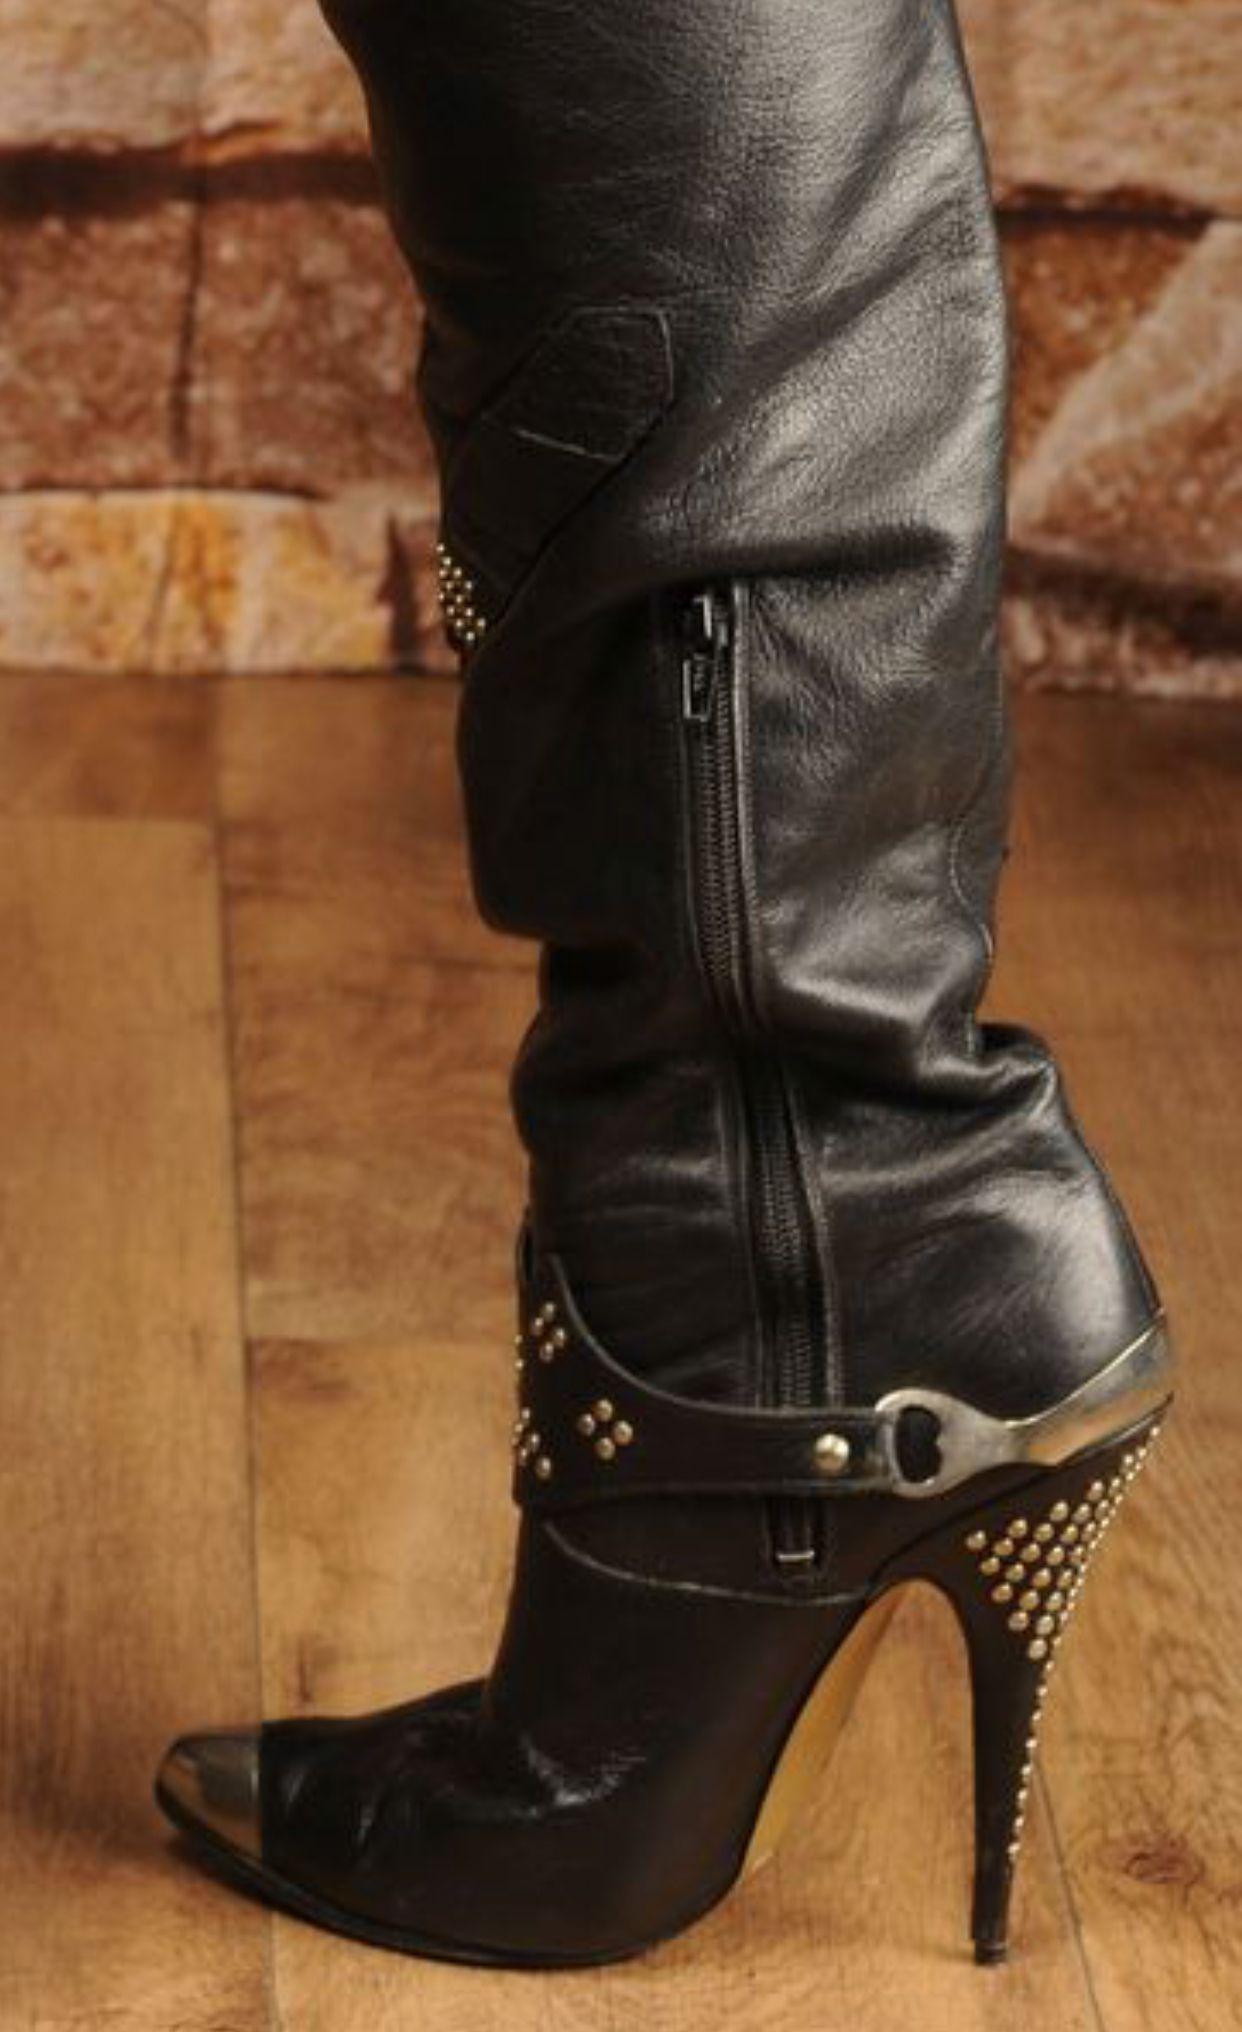 eb8d4be000b67 80s style boots, #SavannahJames #rock #Retro80s | Mistress | Thigh ...